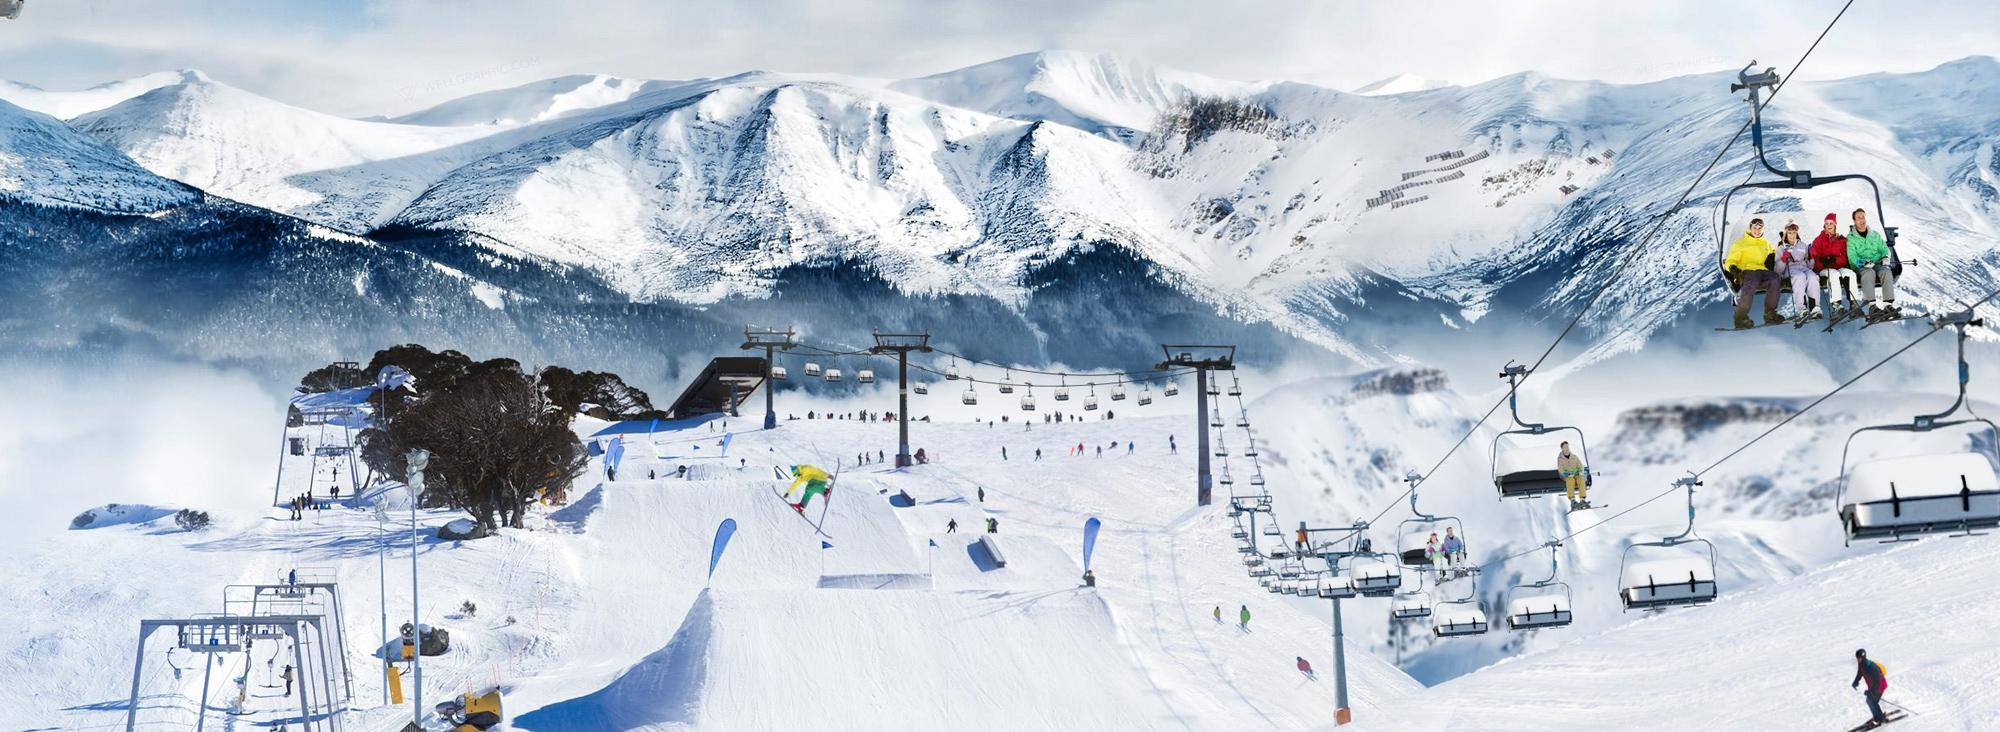 allosurf audience hiver météo neige météo ski